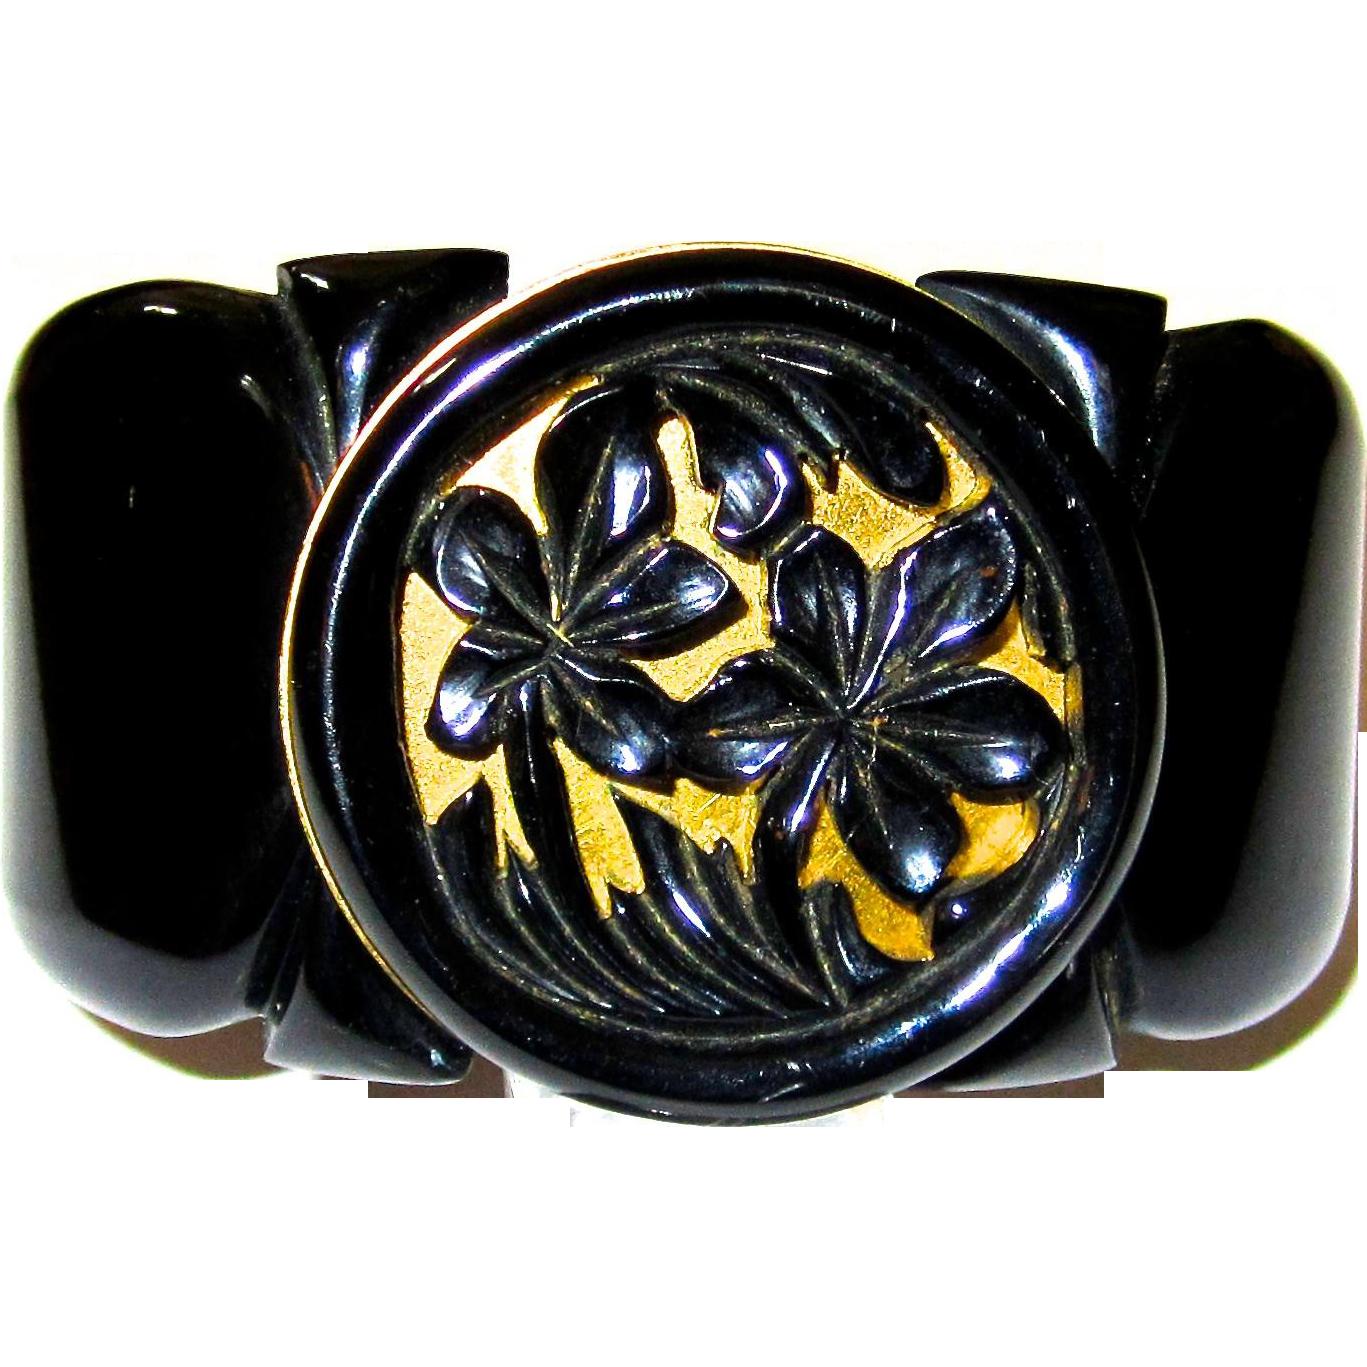 Impressive Black Bakelite Hinge Bracelet with Carved Medallion